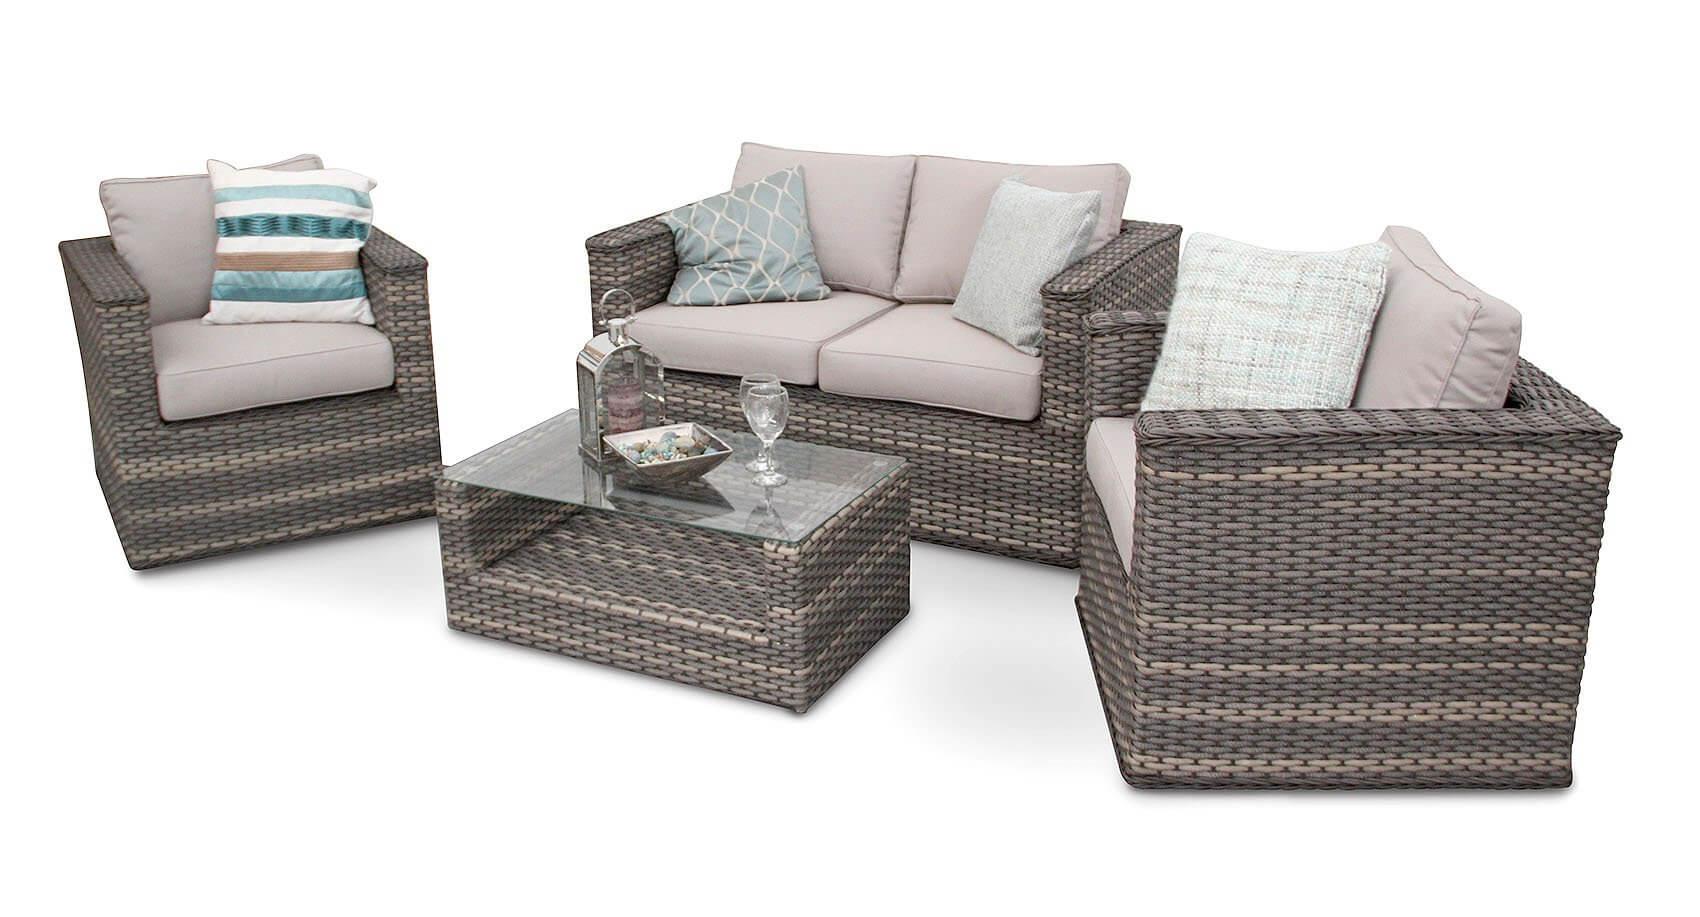 Bahia Modus Rattan Garden Sofa Furniture Set - Natural regarding Natural Cane Media Console Tables (Image 6 of 30)